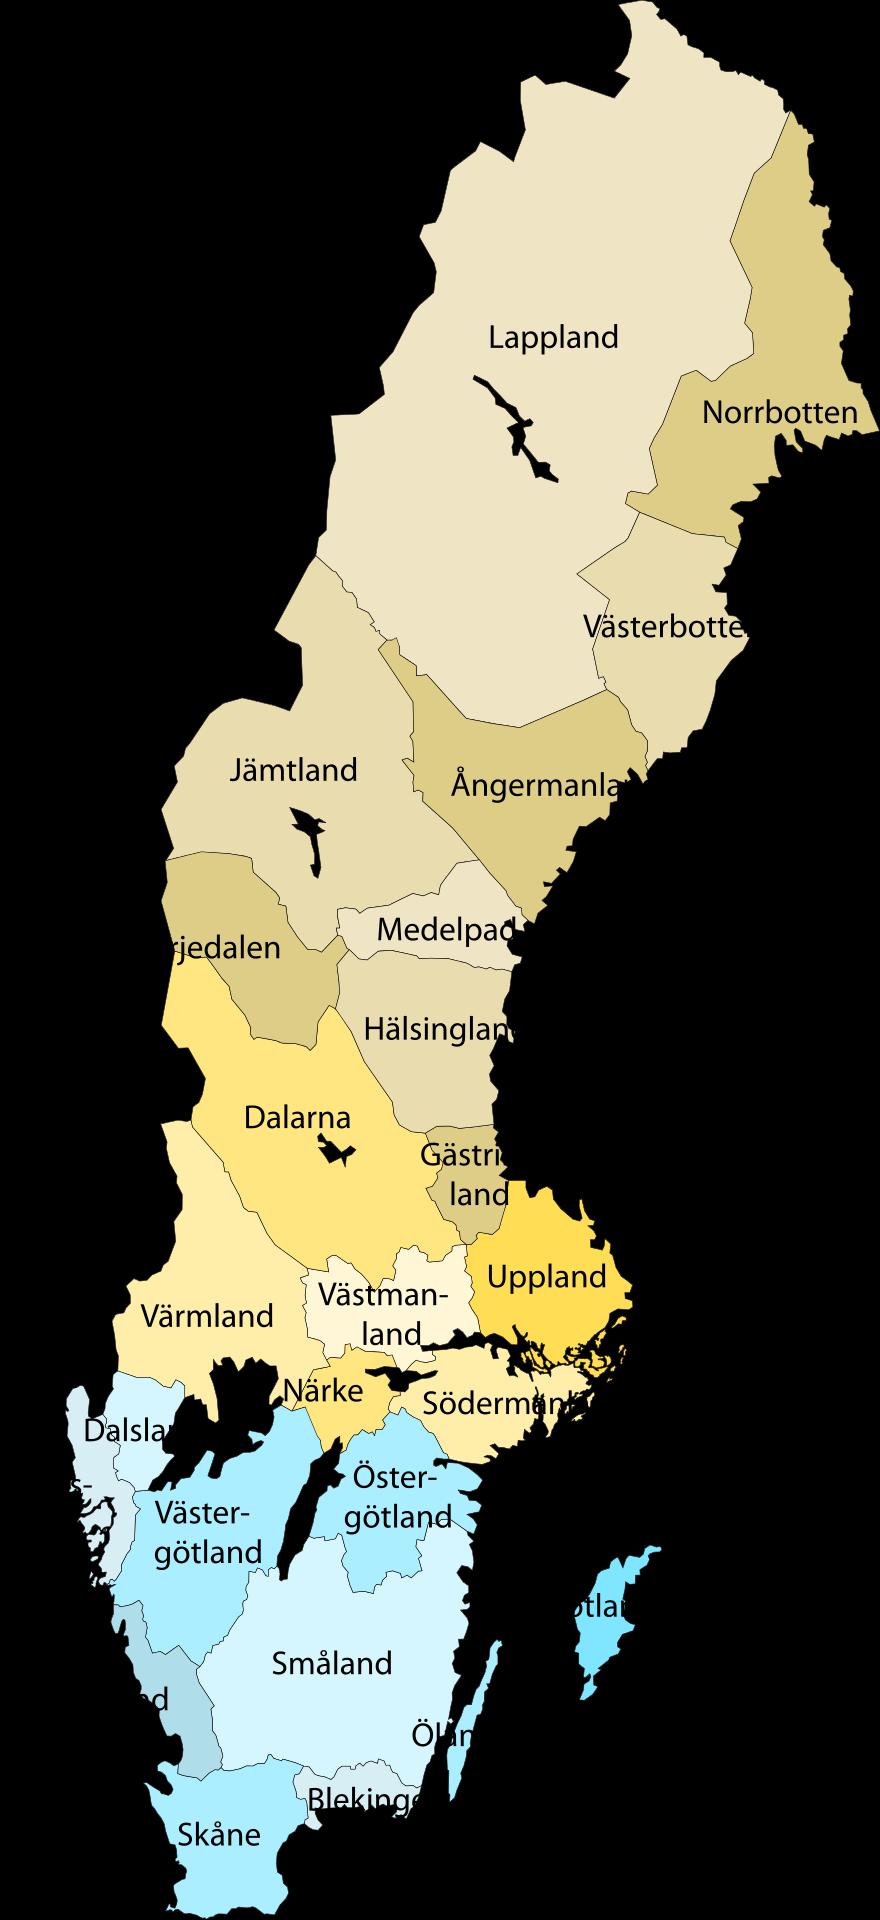 Redigerbar Karta Sverige.Landskap I Sverige Wikipedia Family History Sverige Stockholm